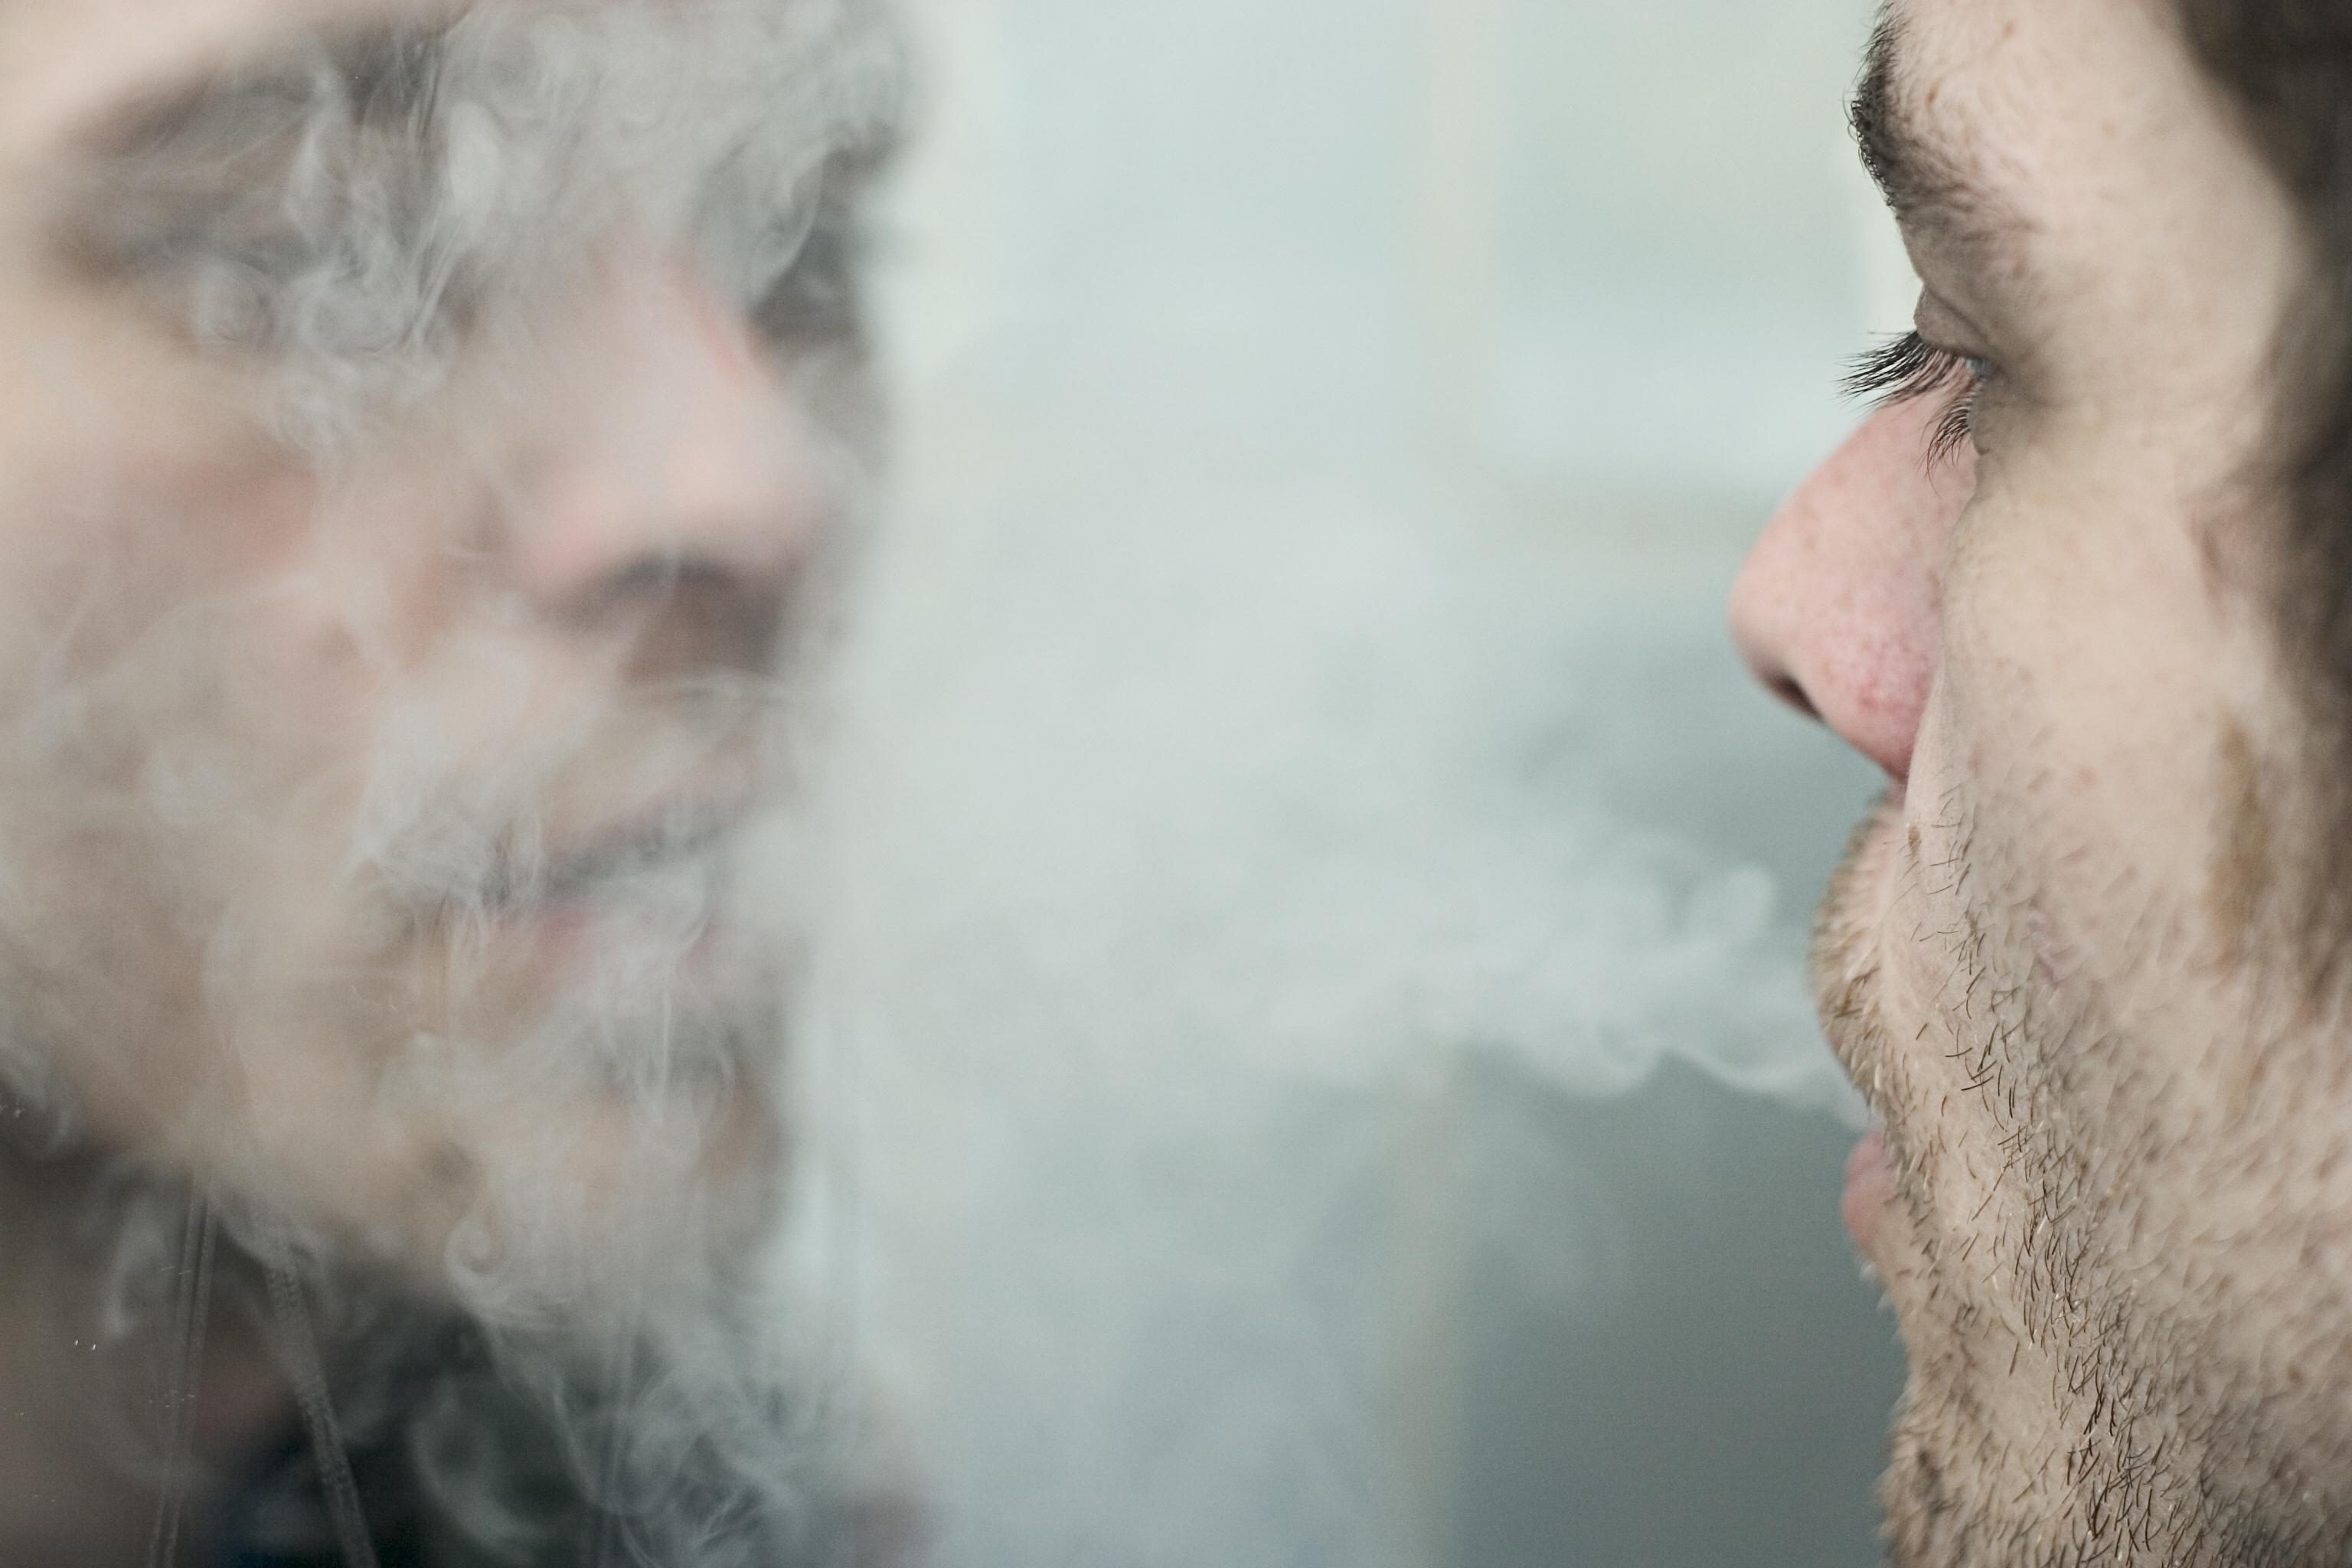 Man blowing smoke into a mirror.